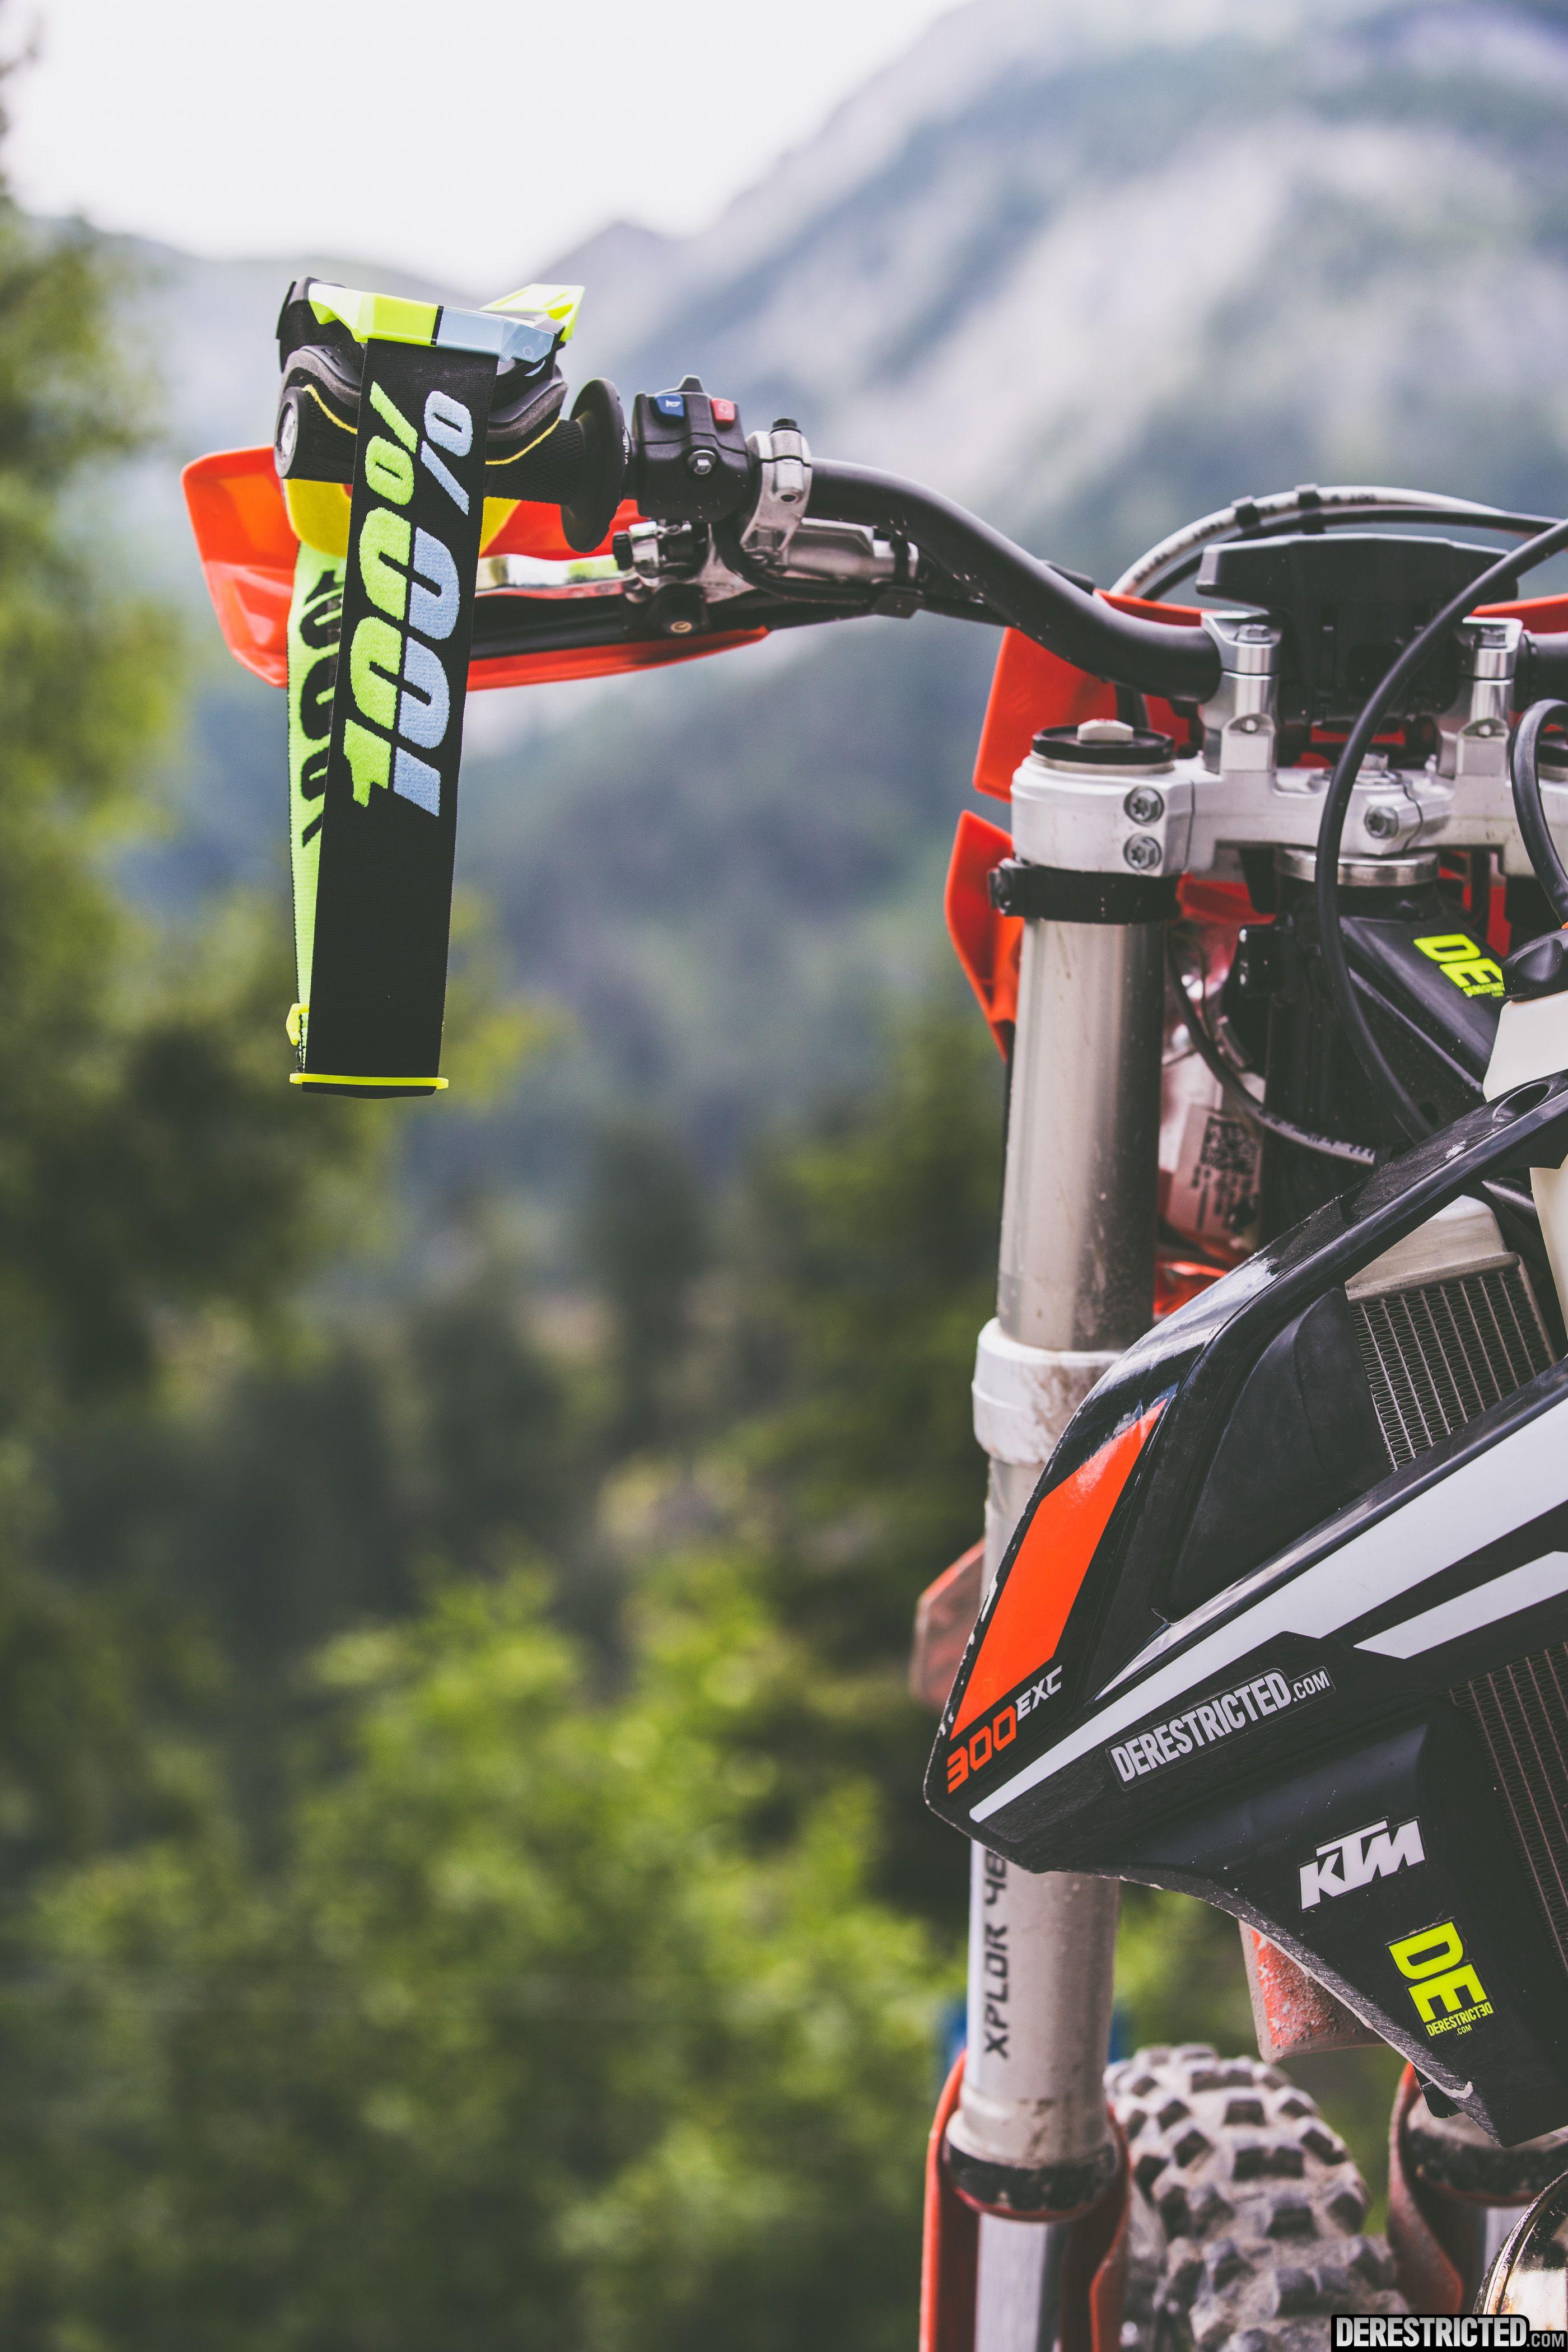 First Look: 2017 KTM Minicycles - Dirt Bike Test